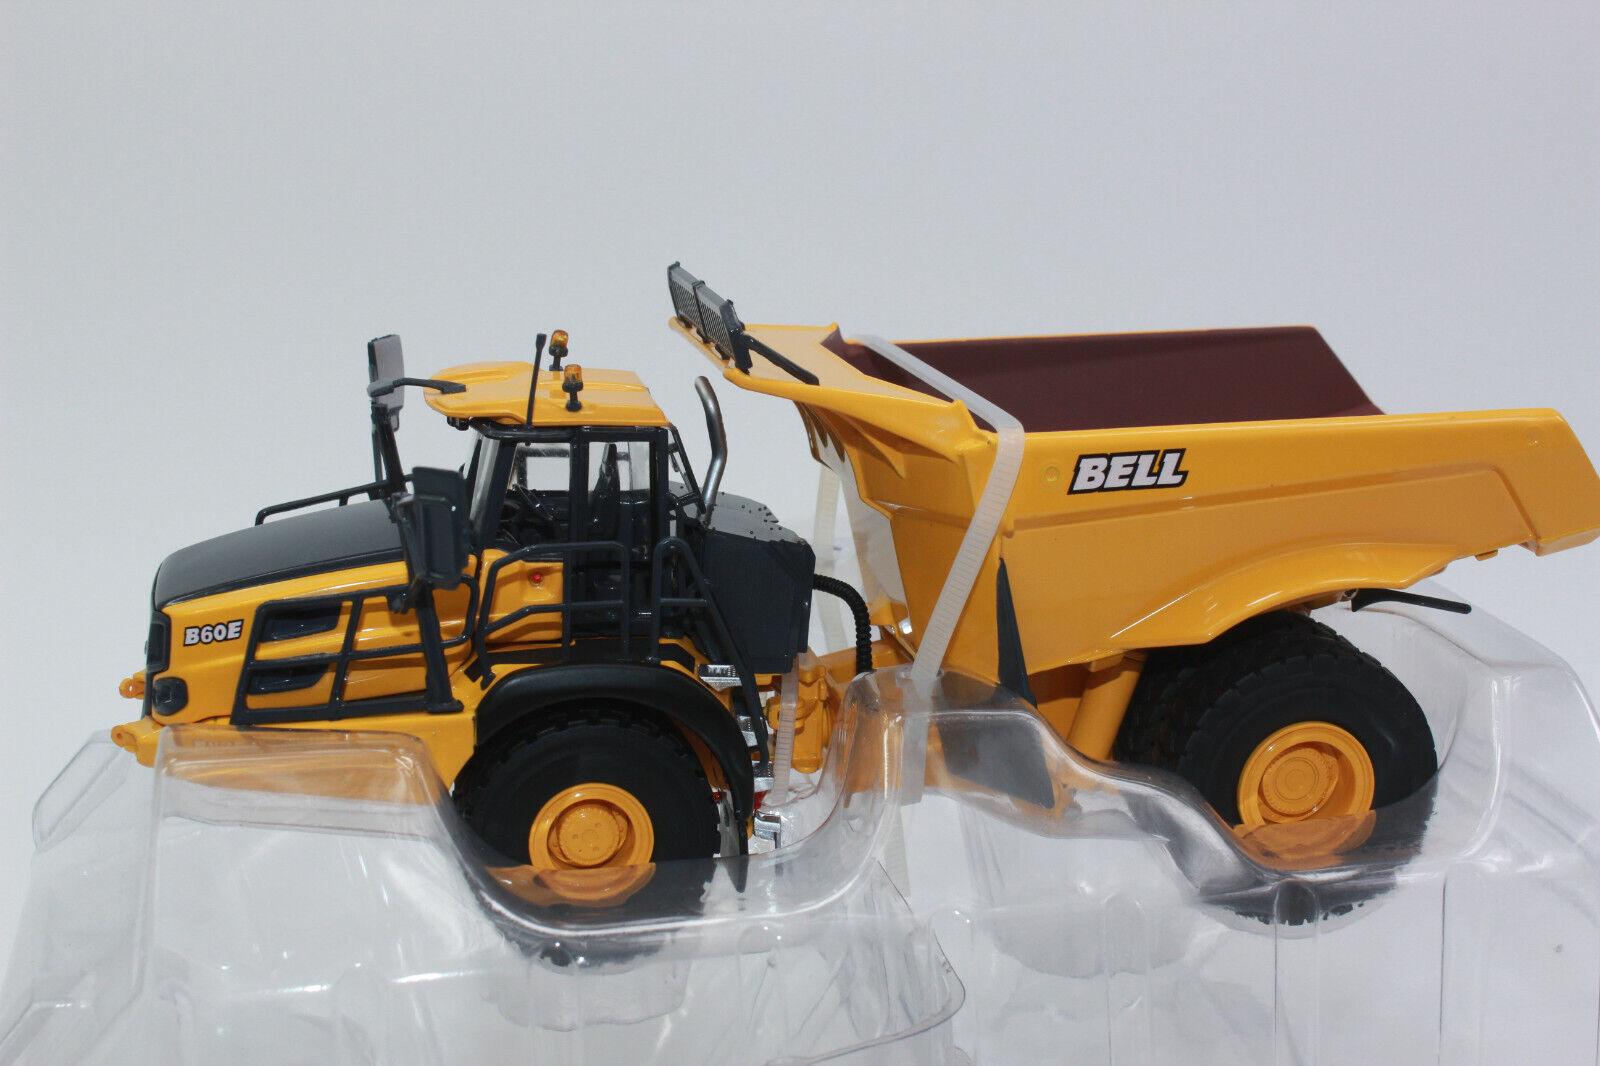 USK 31015 Bell b60e camion tombereaux AUTOMOTEURS 1 50 neuf avec neuf dans sa boîte